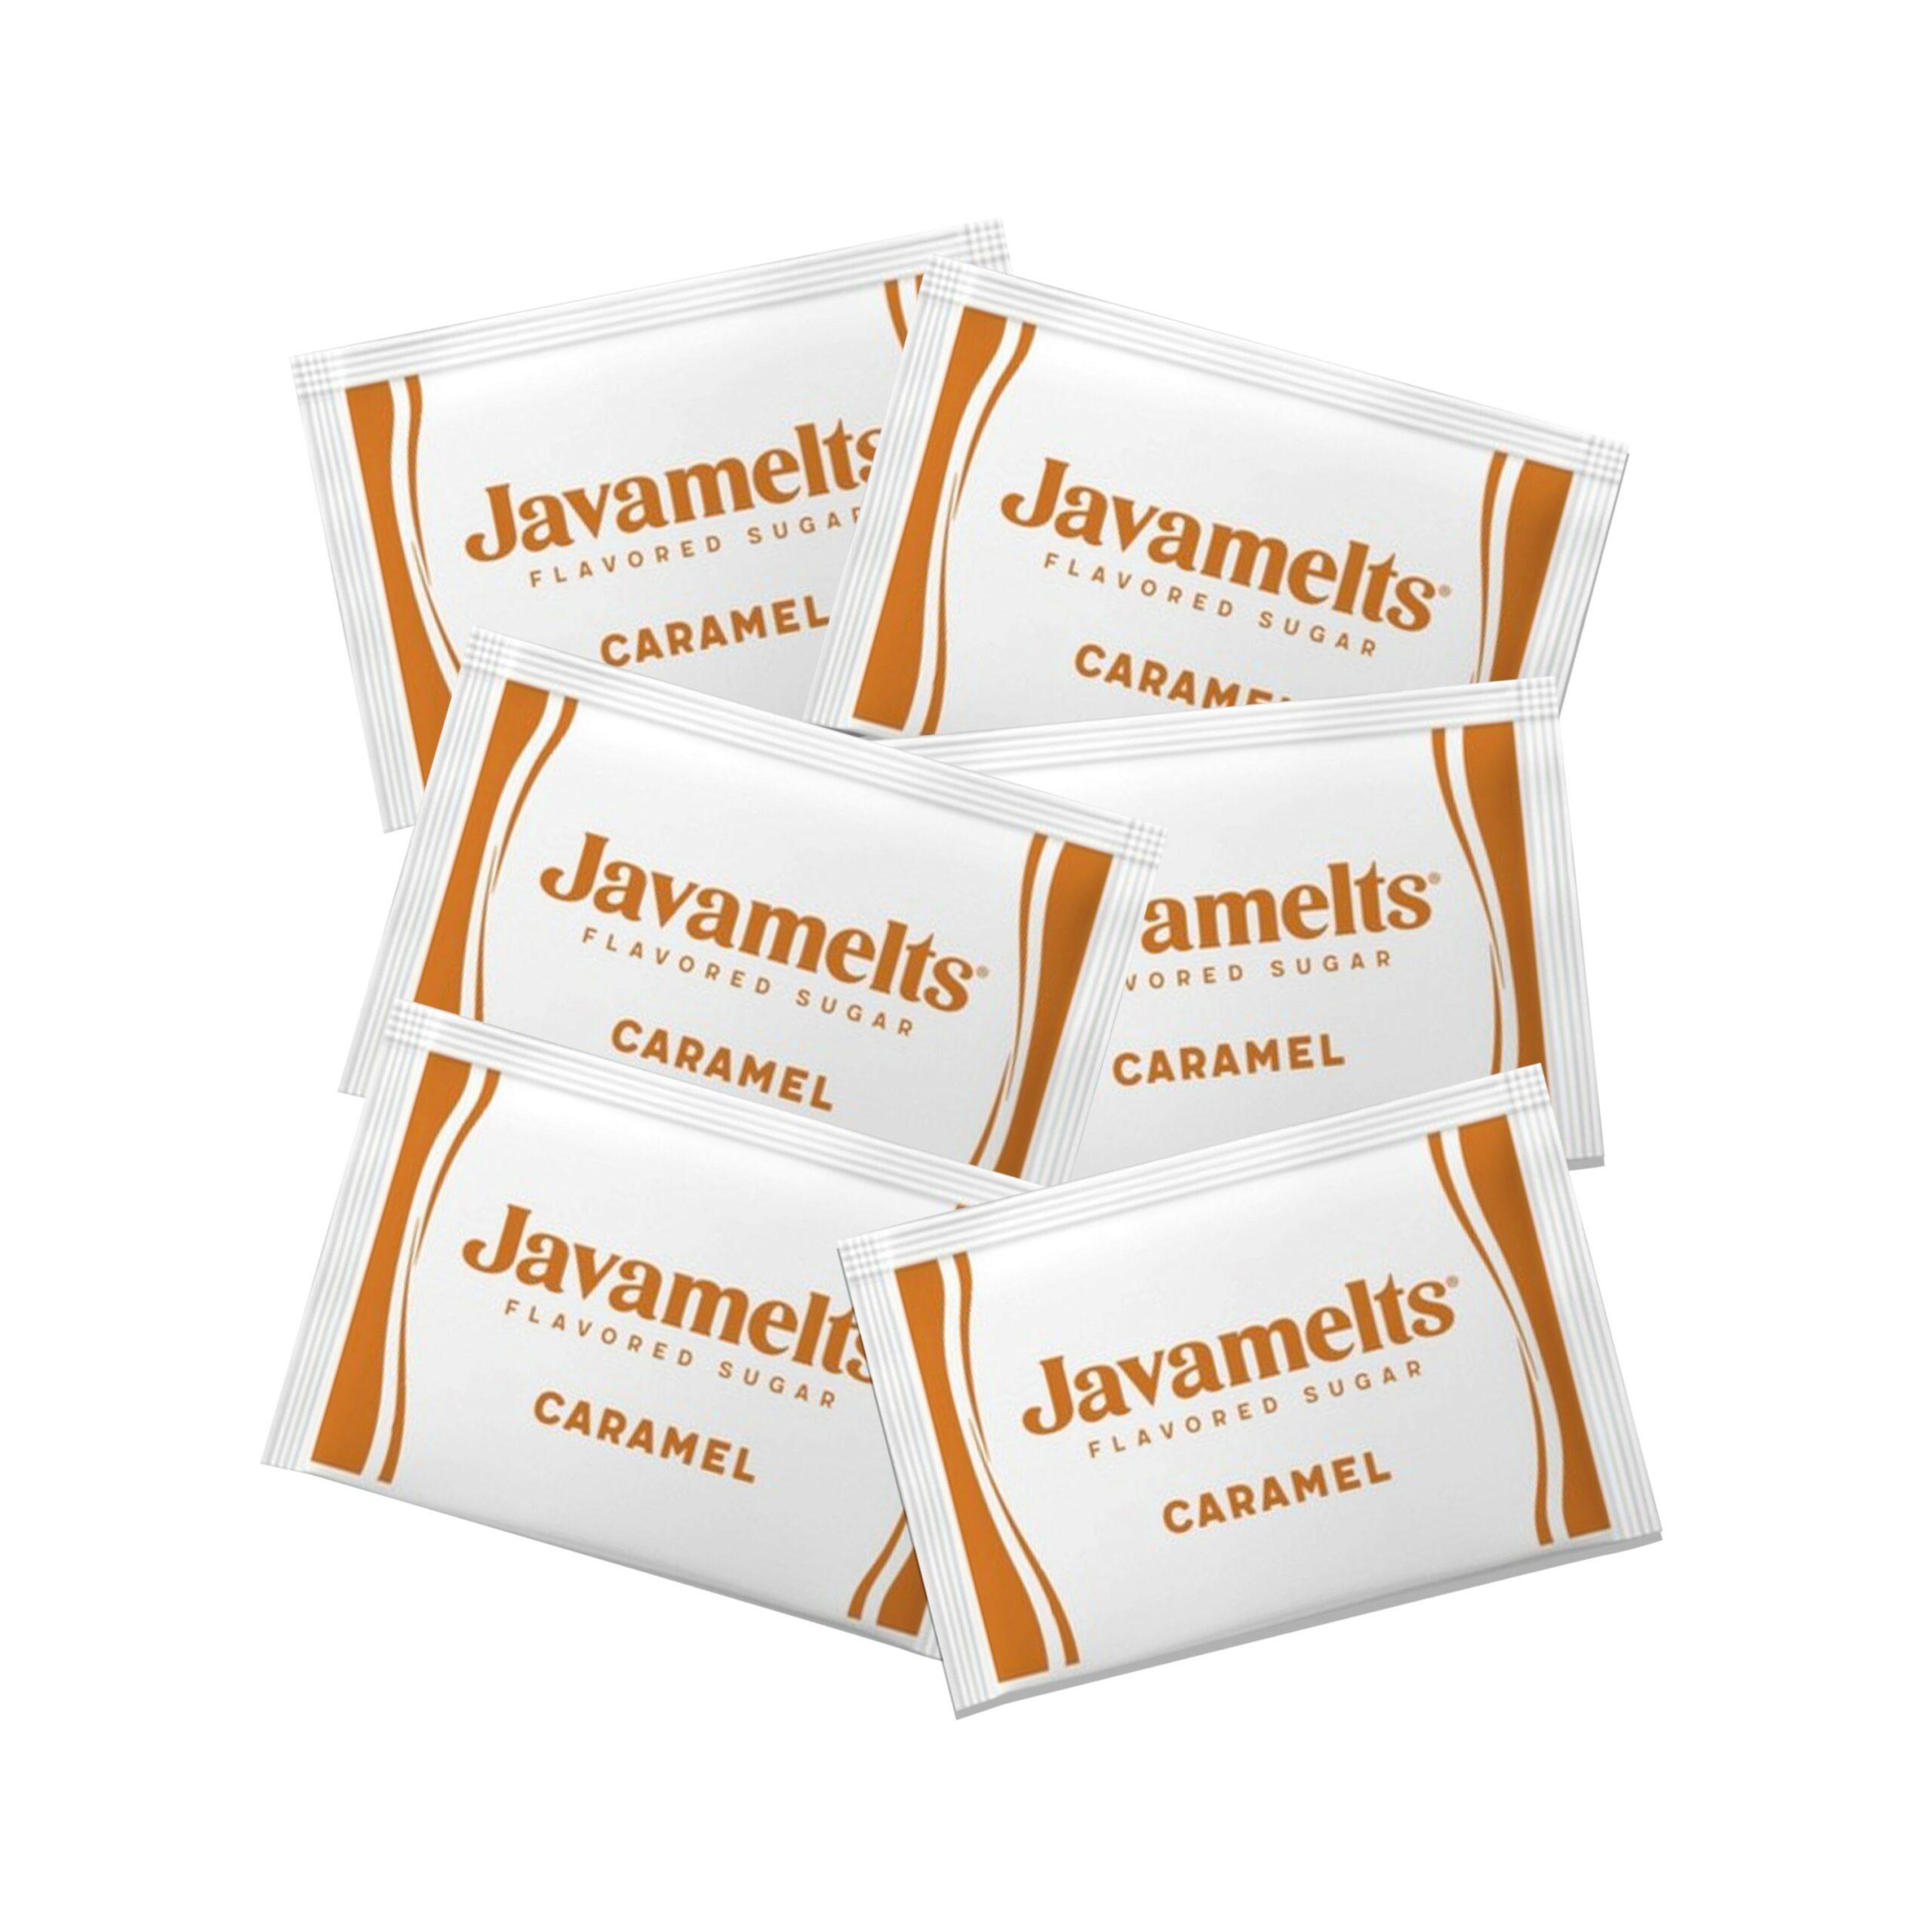 Javamelts Caramel Flavored Sugar Packets LIFCMarketplace